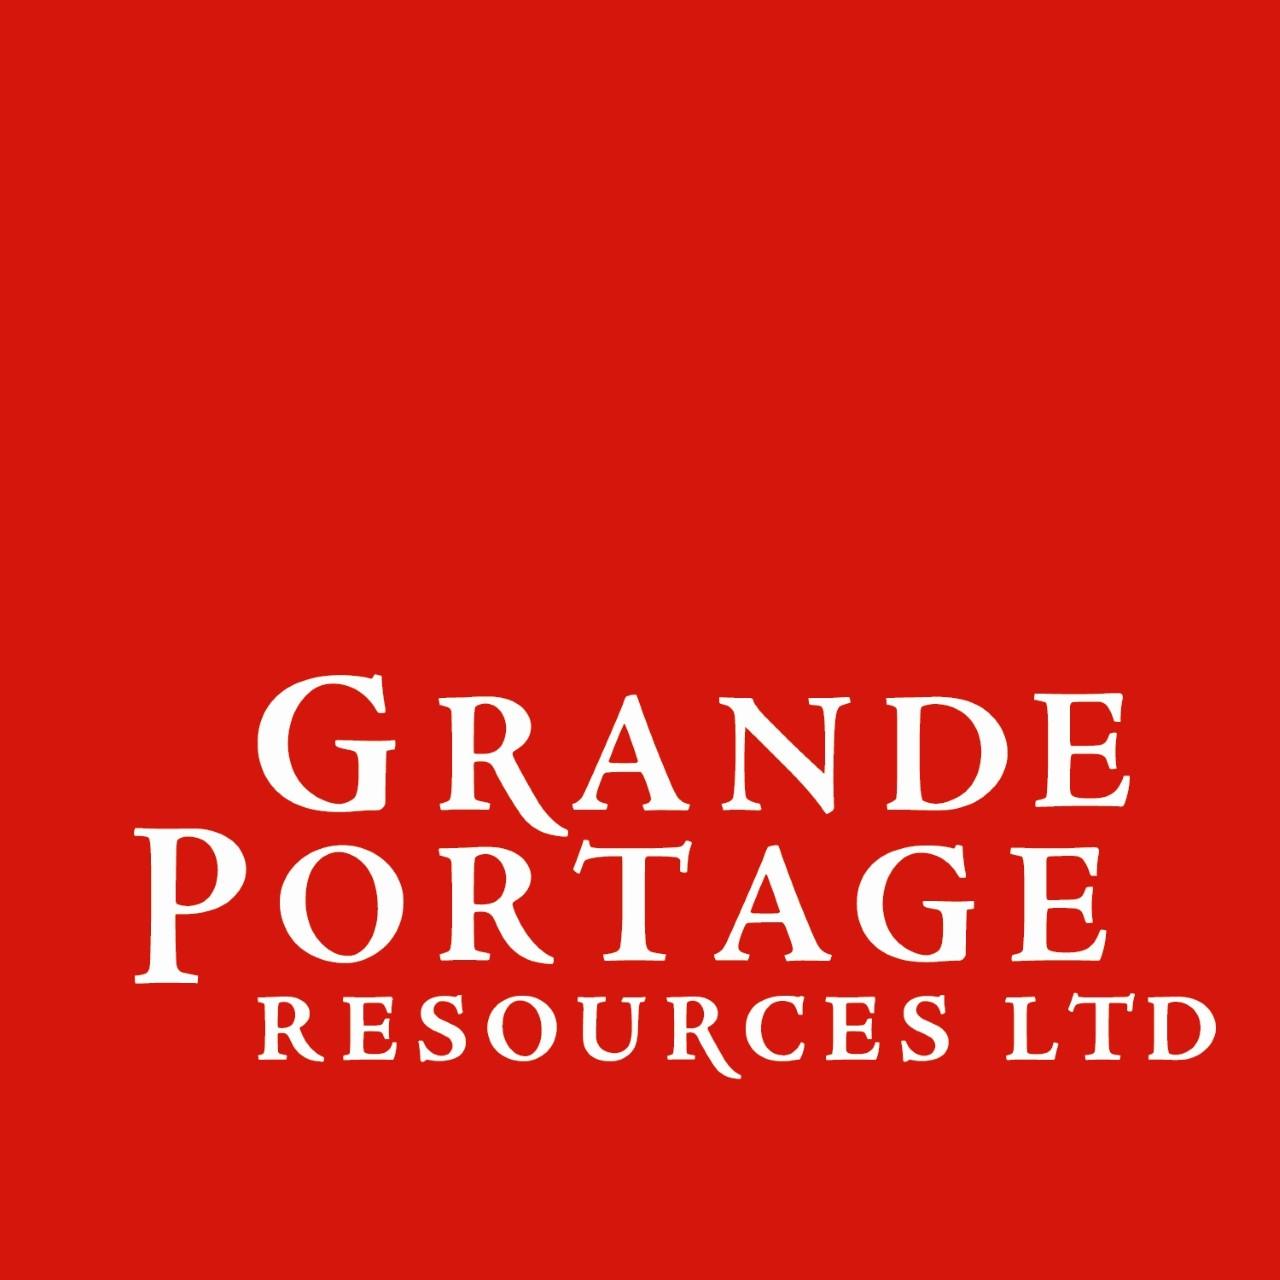 Grande Portage Resources Ltd. (OTCQB:GPTRF)